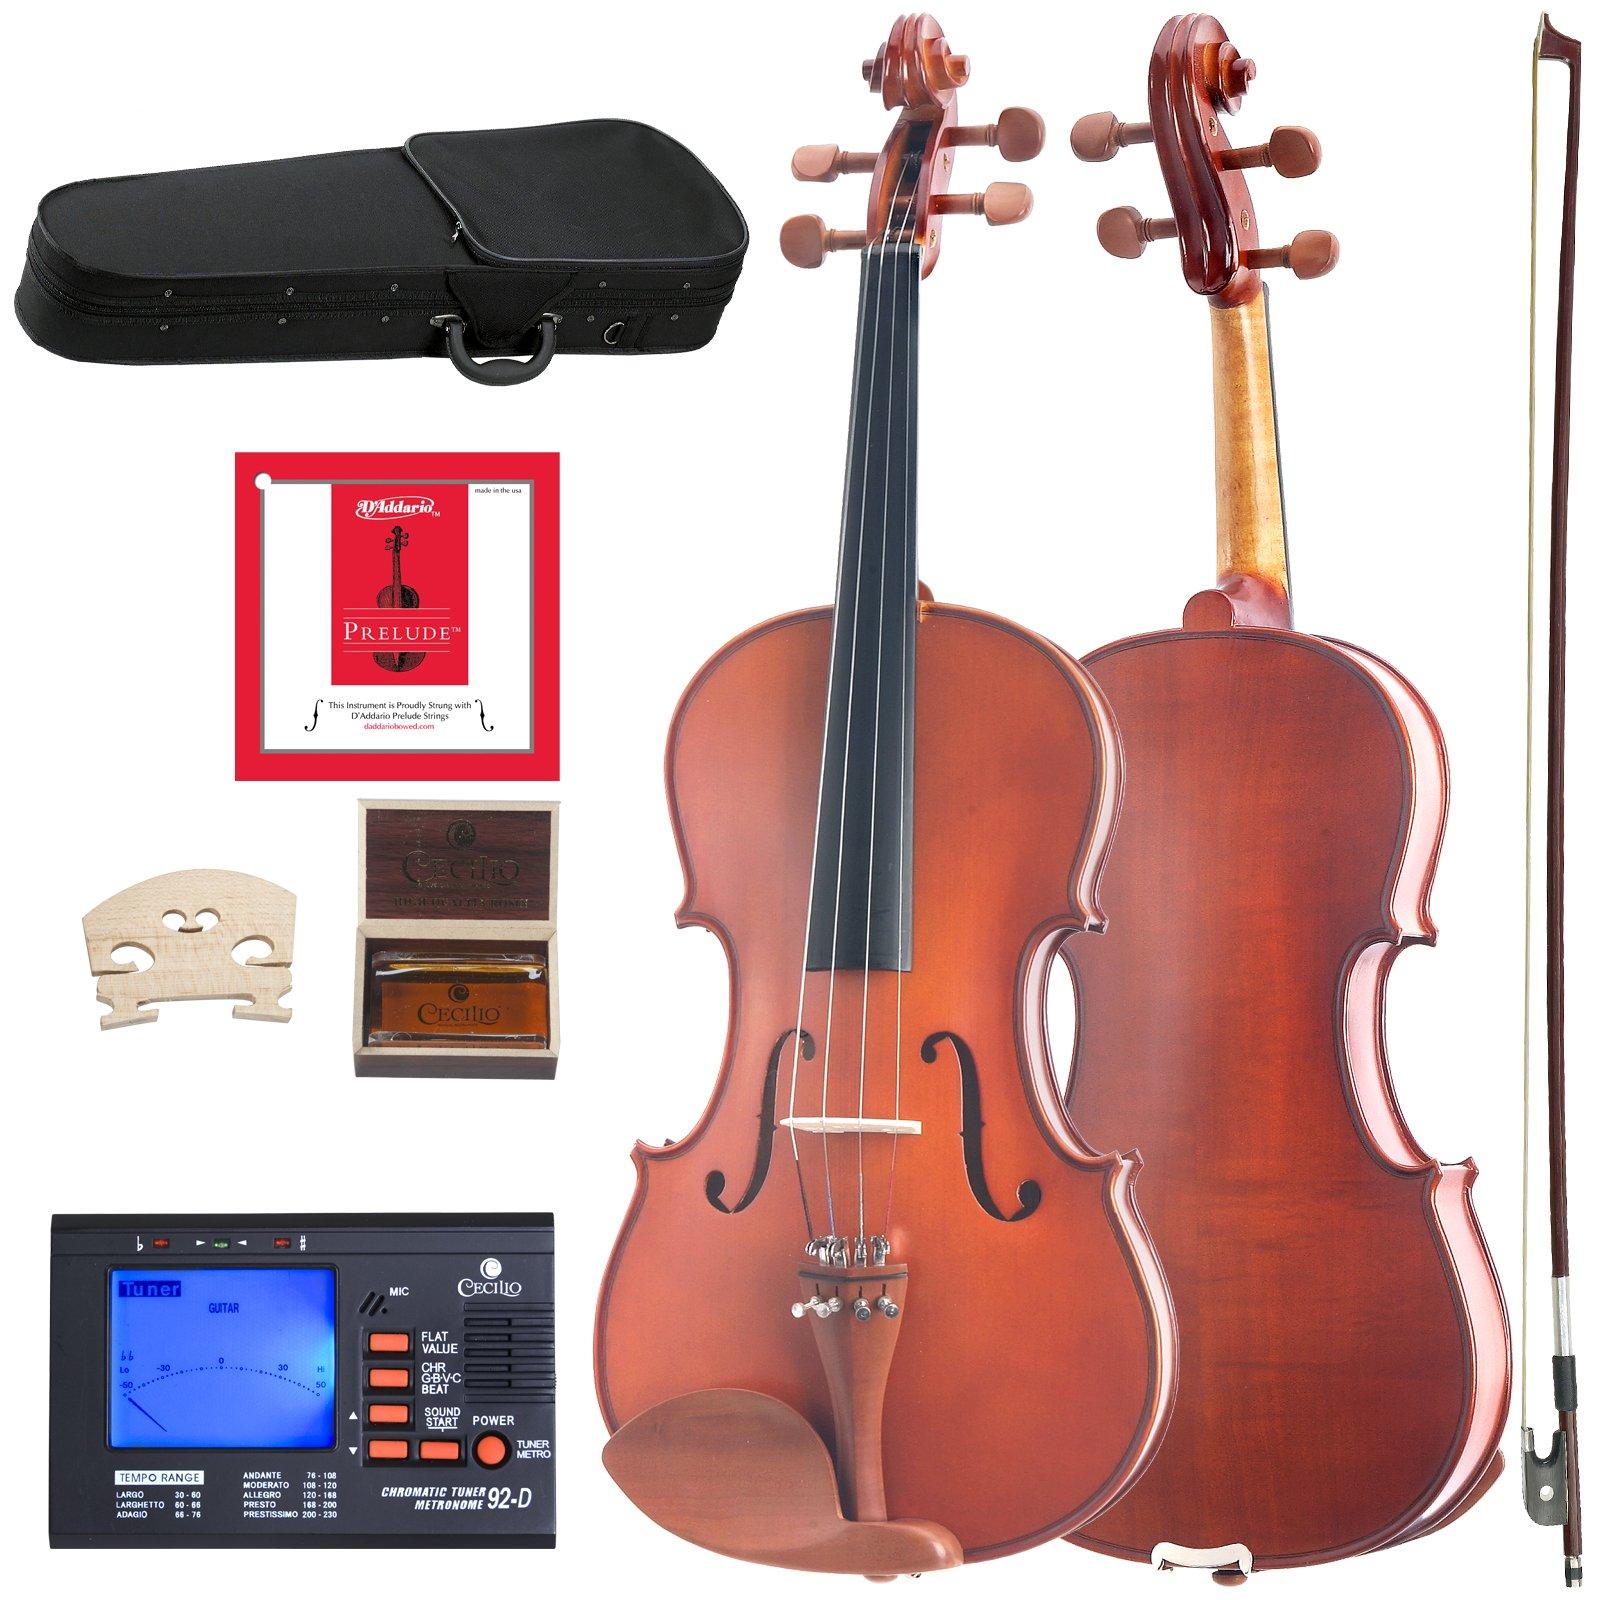 Cecilio CVA-400 Solidwood Viola with D'Addario Prelude Strings, Size 16-Inch by Cecilio